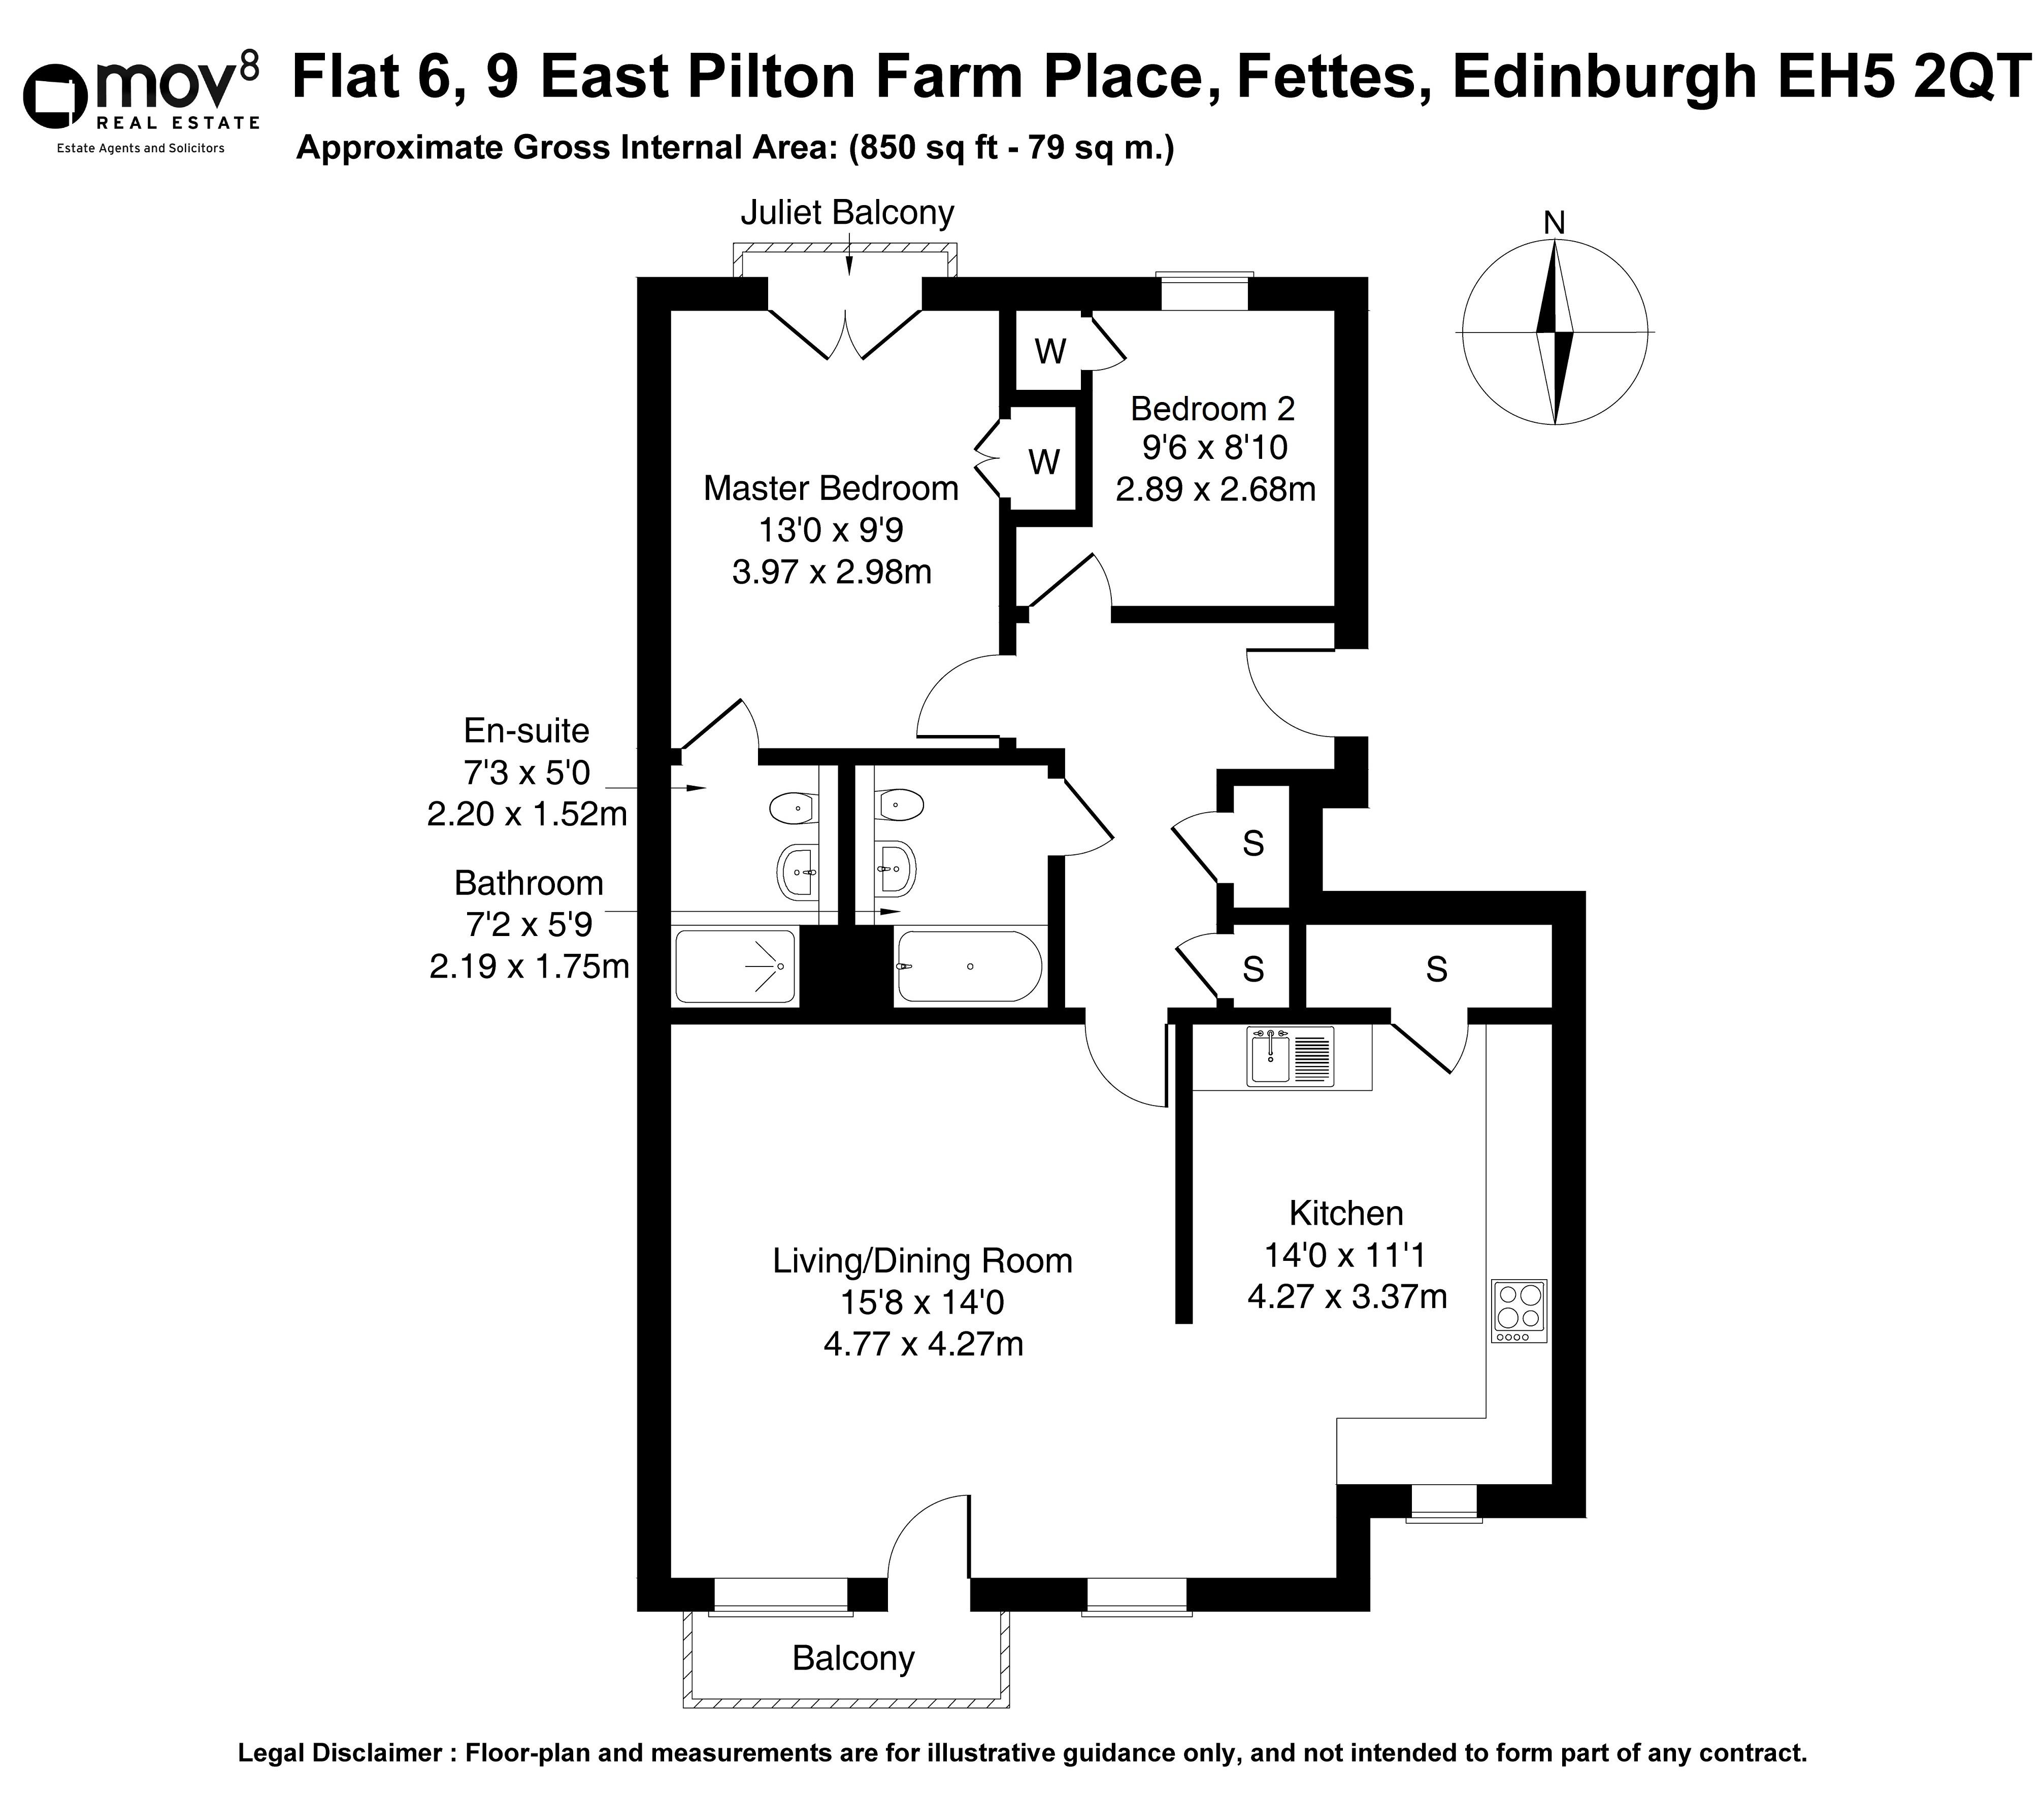 Floorplan 1 of Flat 6, 9 East Pilton Farm Place, Fettes, Edinburgh, EH5 2QT